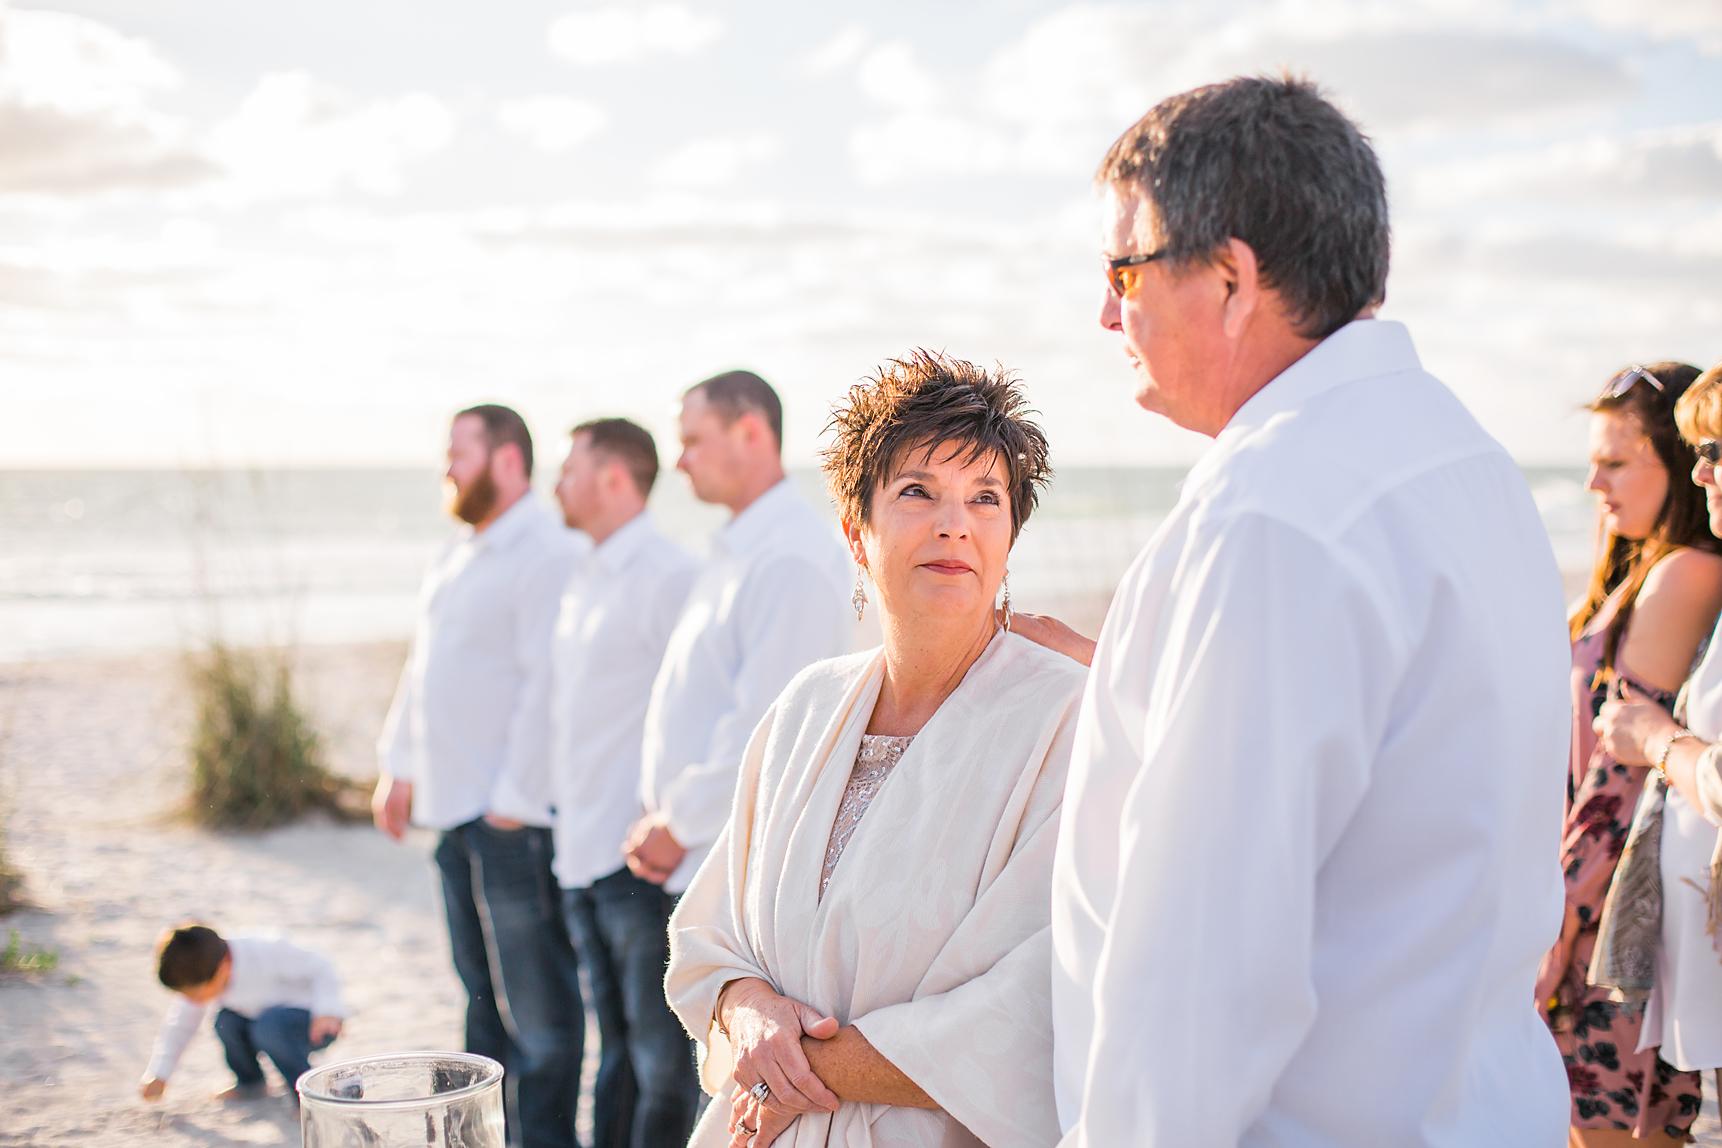 Bailey + Chalin - Anna Maria Island Wedding Photographer - Destination Wedding Photography - Emily & Co. Photography - Beach Wedding Photography (24).jpg